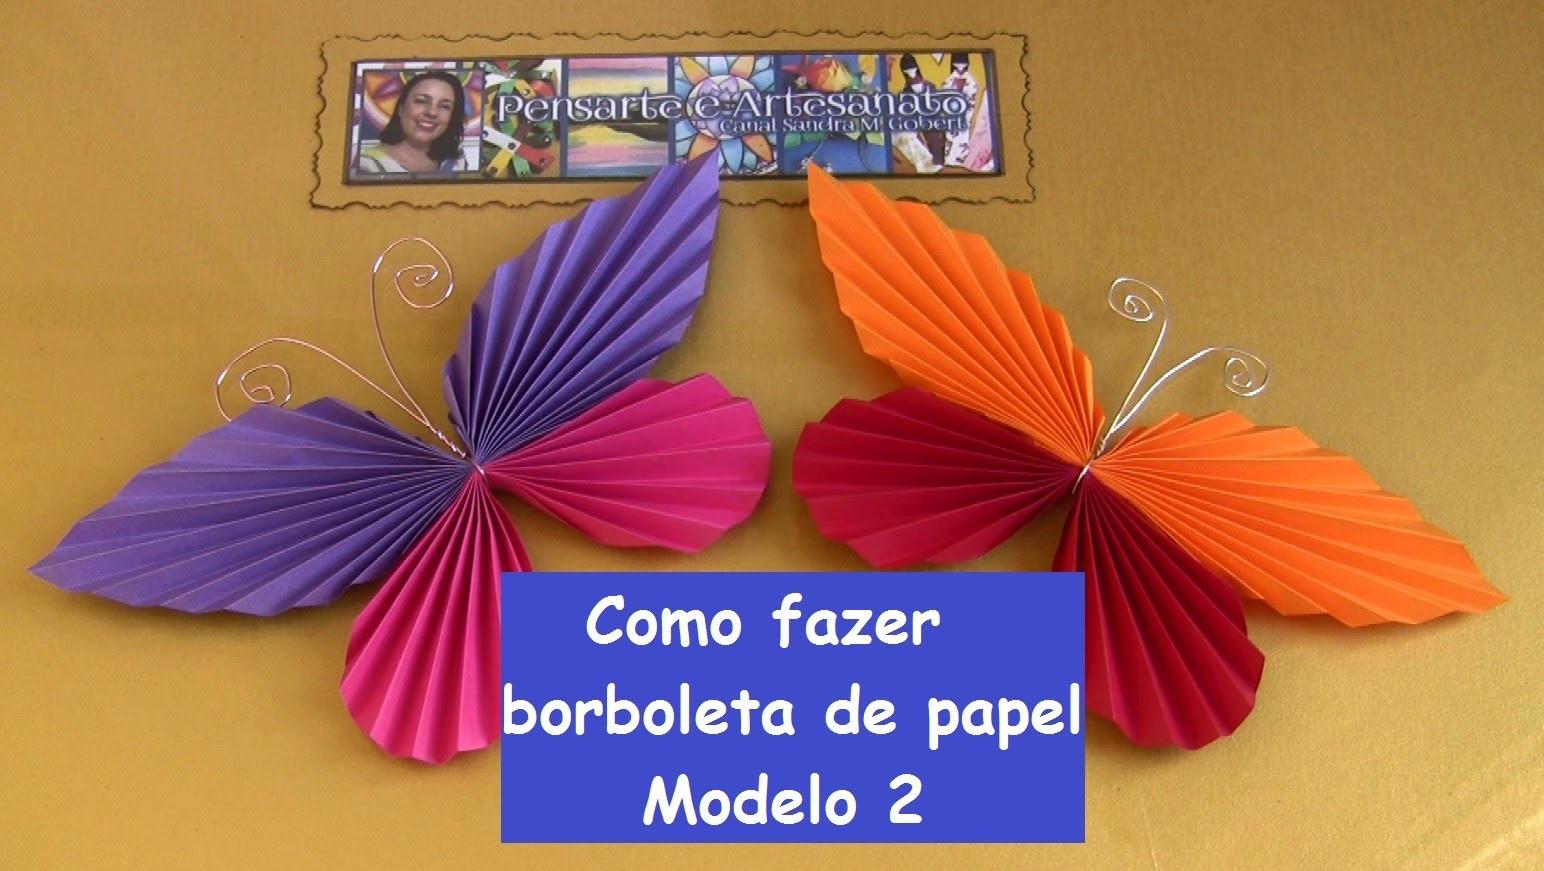 COMO FAZER BORBOLETA DE PAPEL MODELO 2